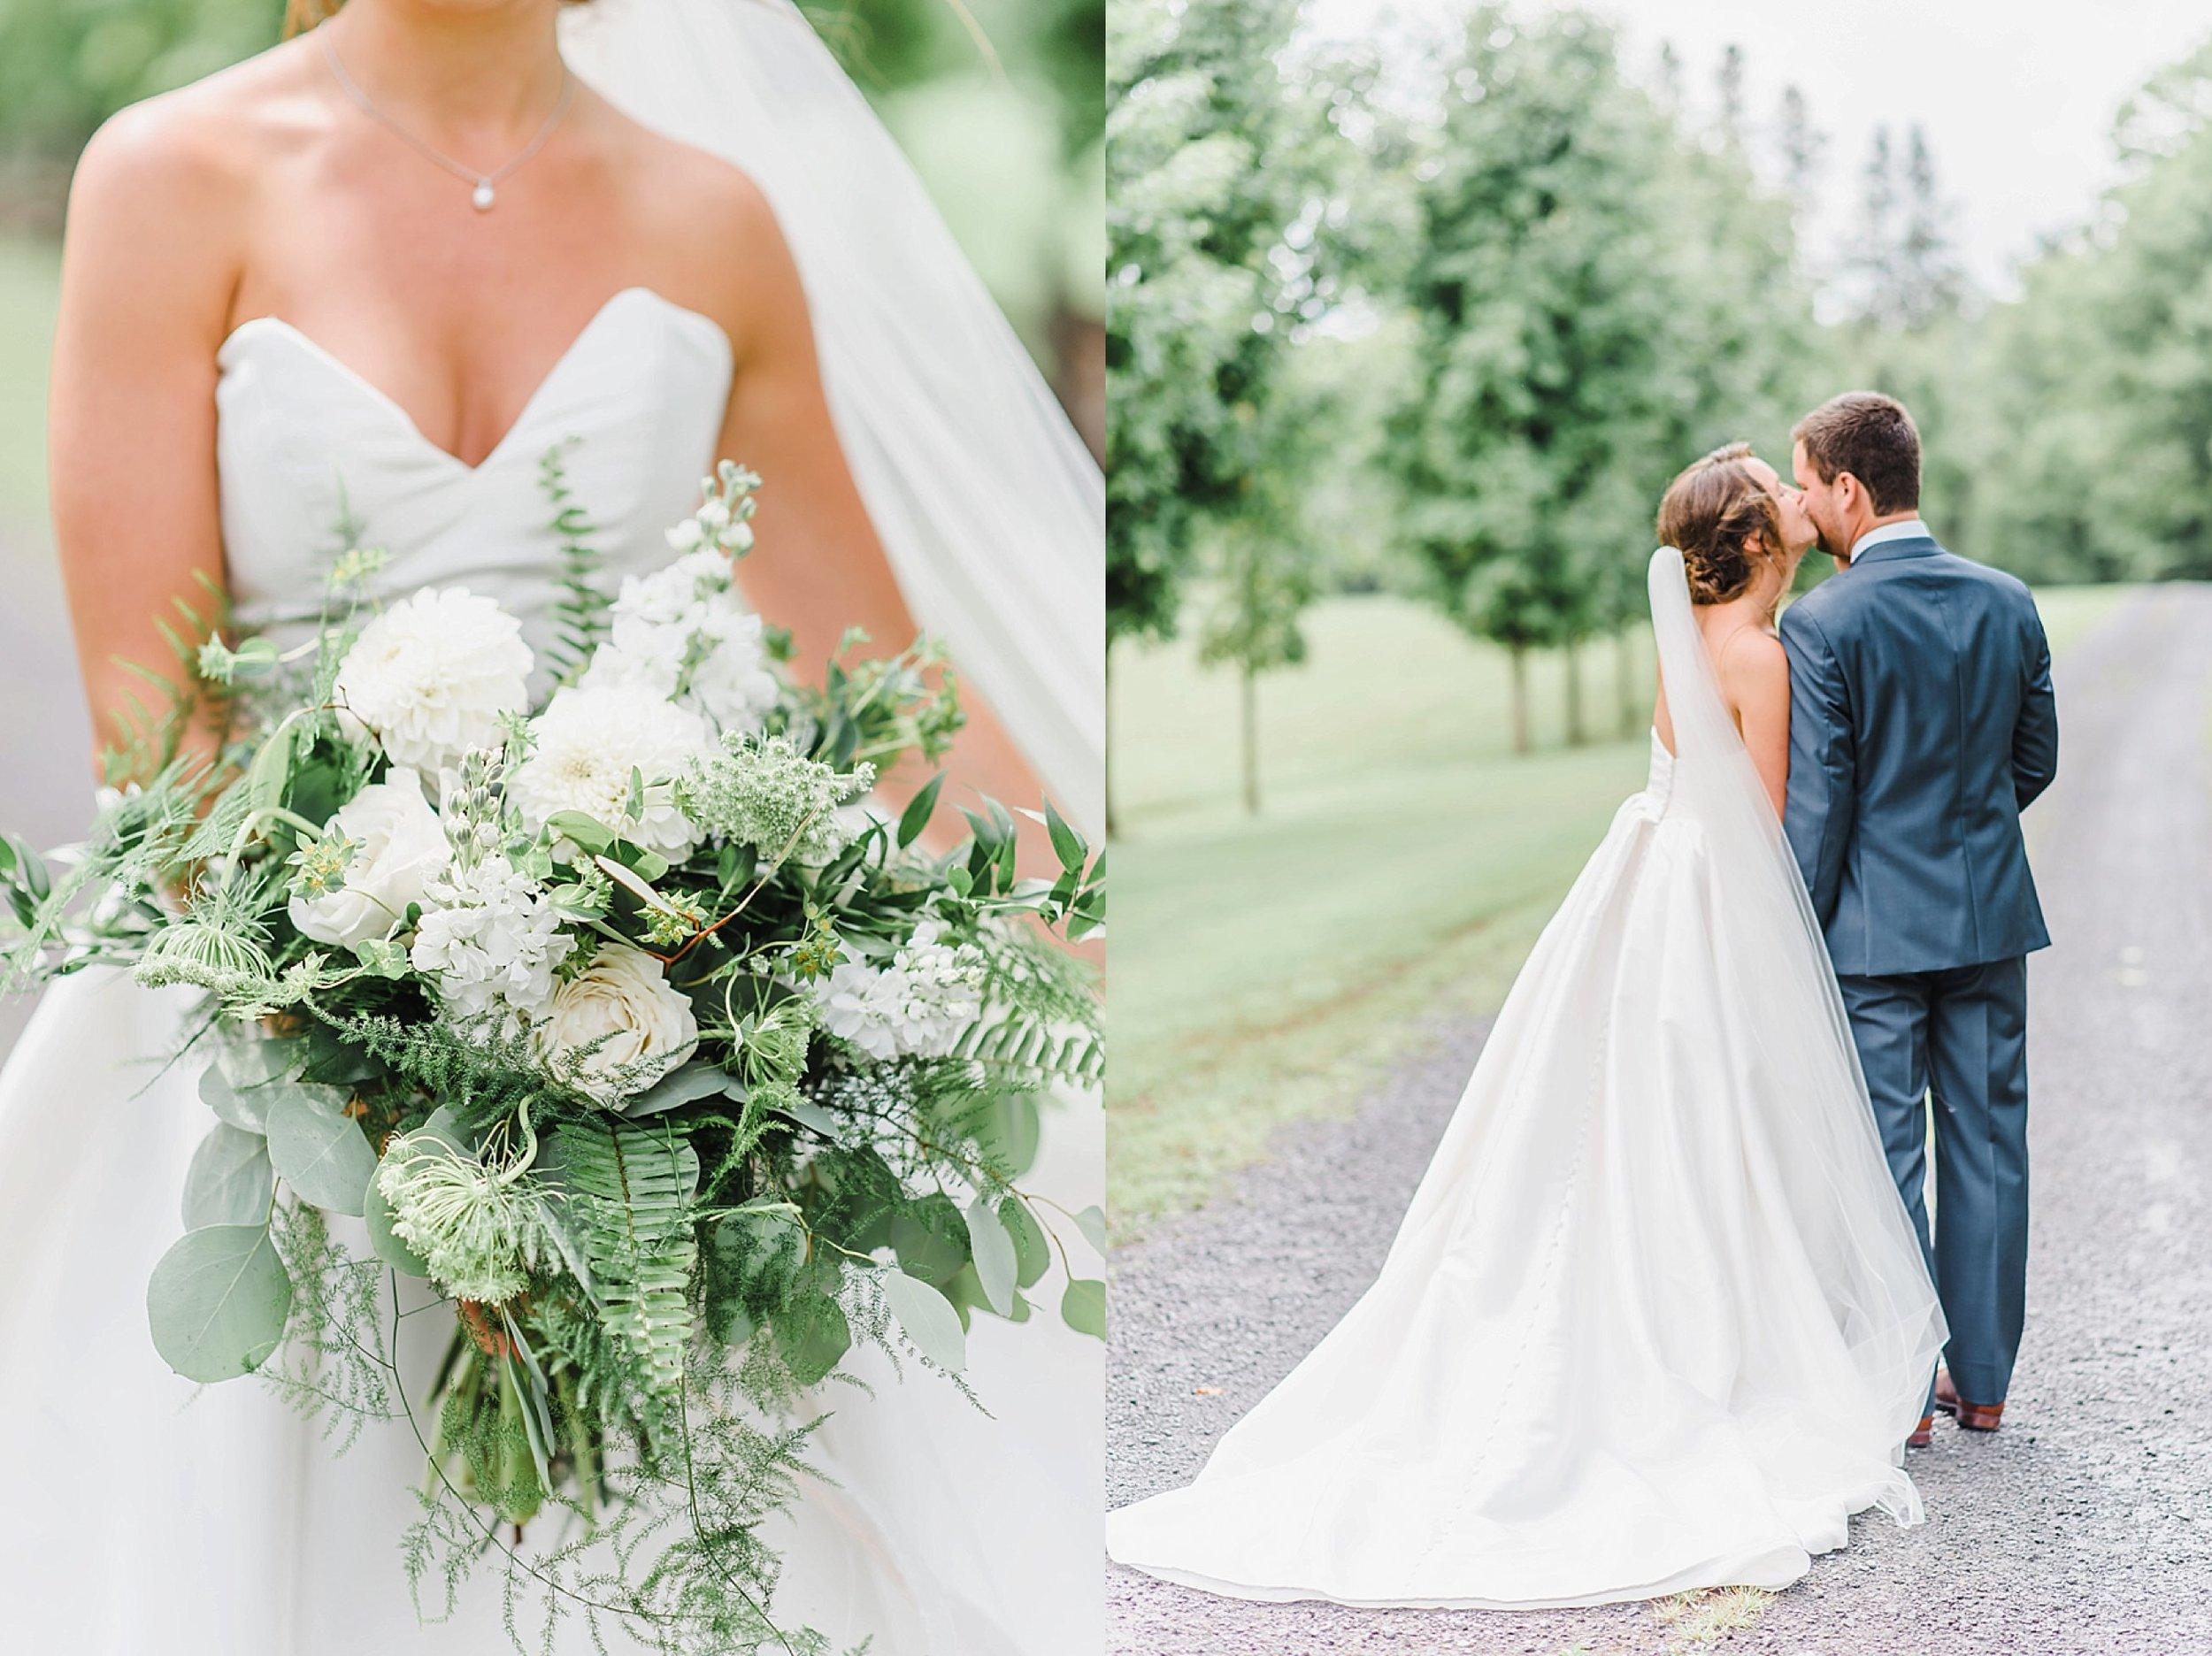 light airy indie fine art ottawa wedding photographer | Ali and Batoul Photography_0502.jpg